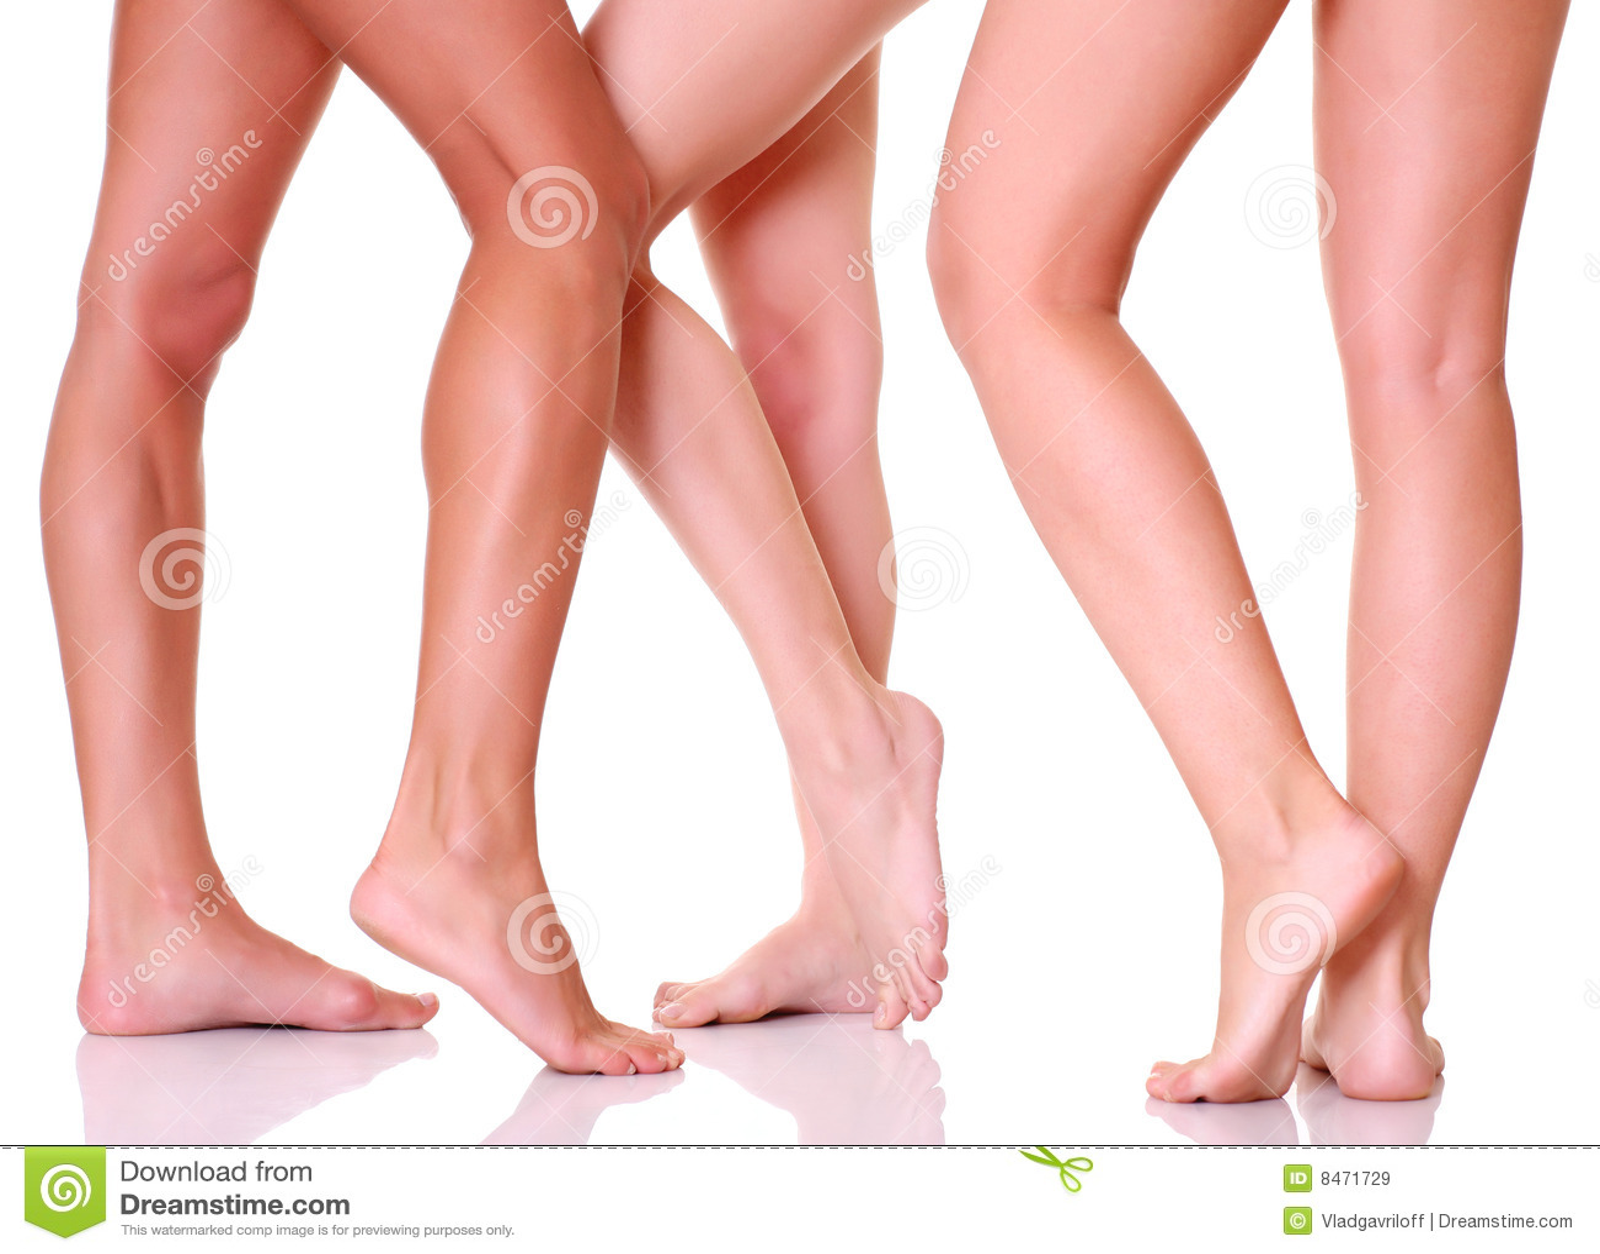 Free female feet pics